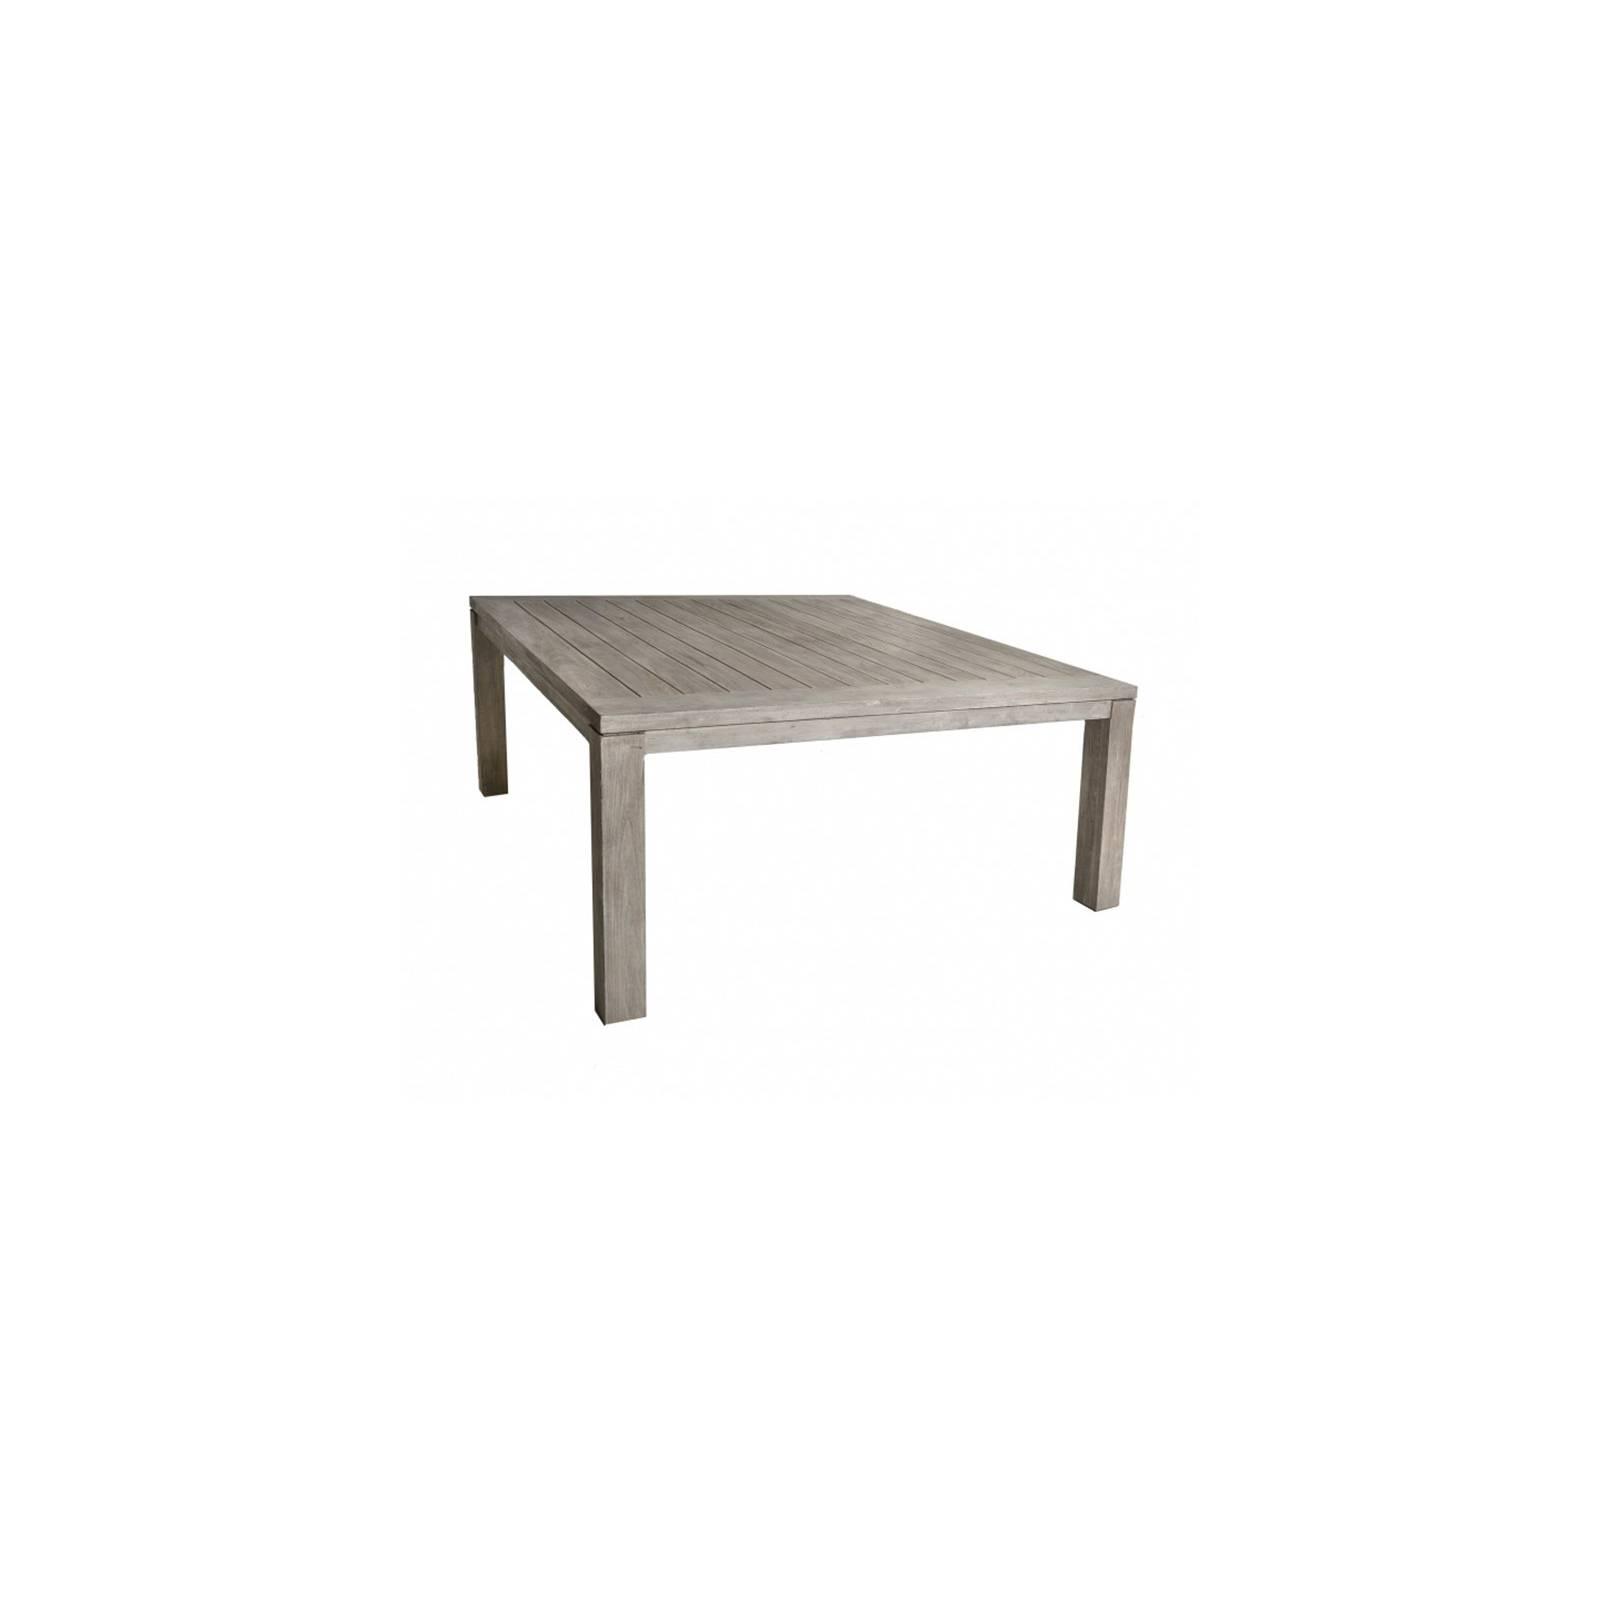 Table De Repas Carrée Grisée Taman Teck Recyclé - meuble de jardin